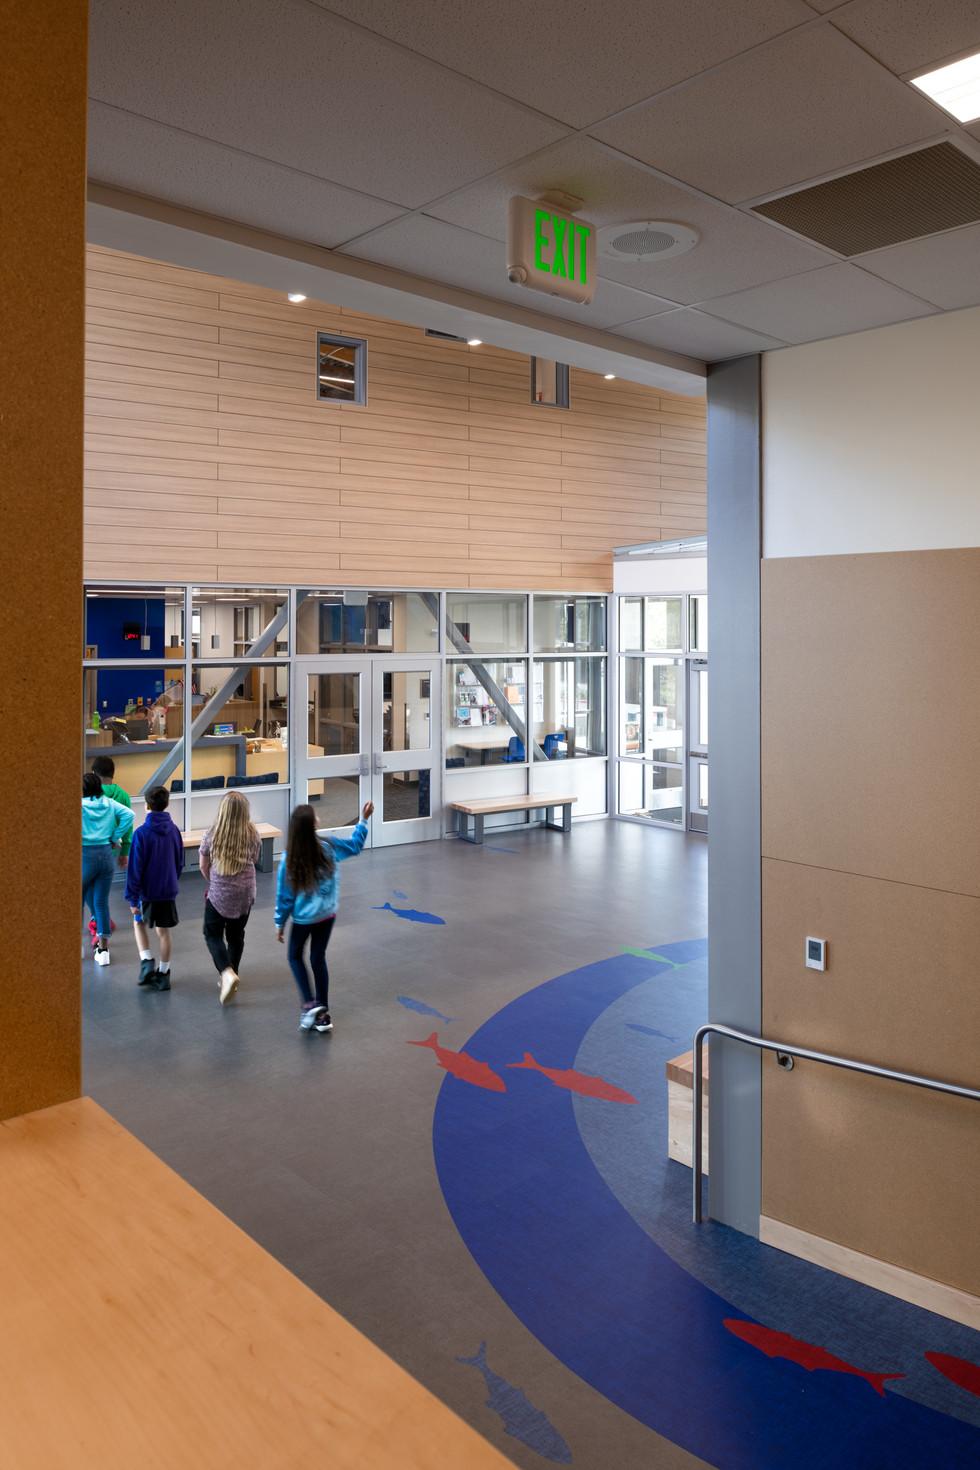 Des Moines Elementary School Interior Hallway